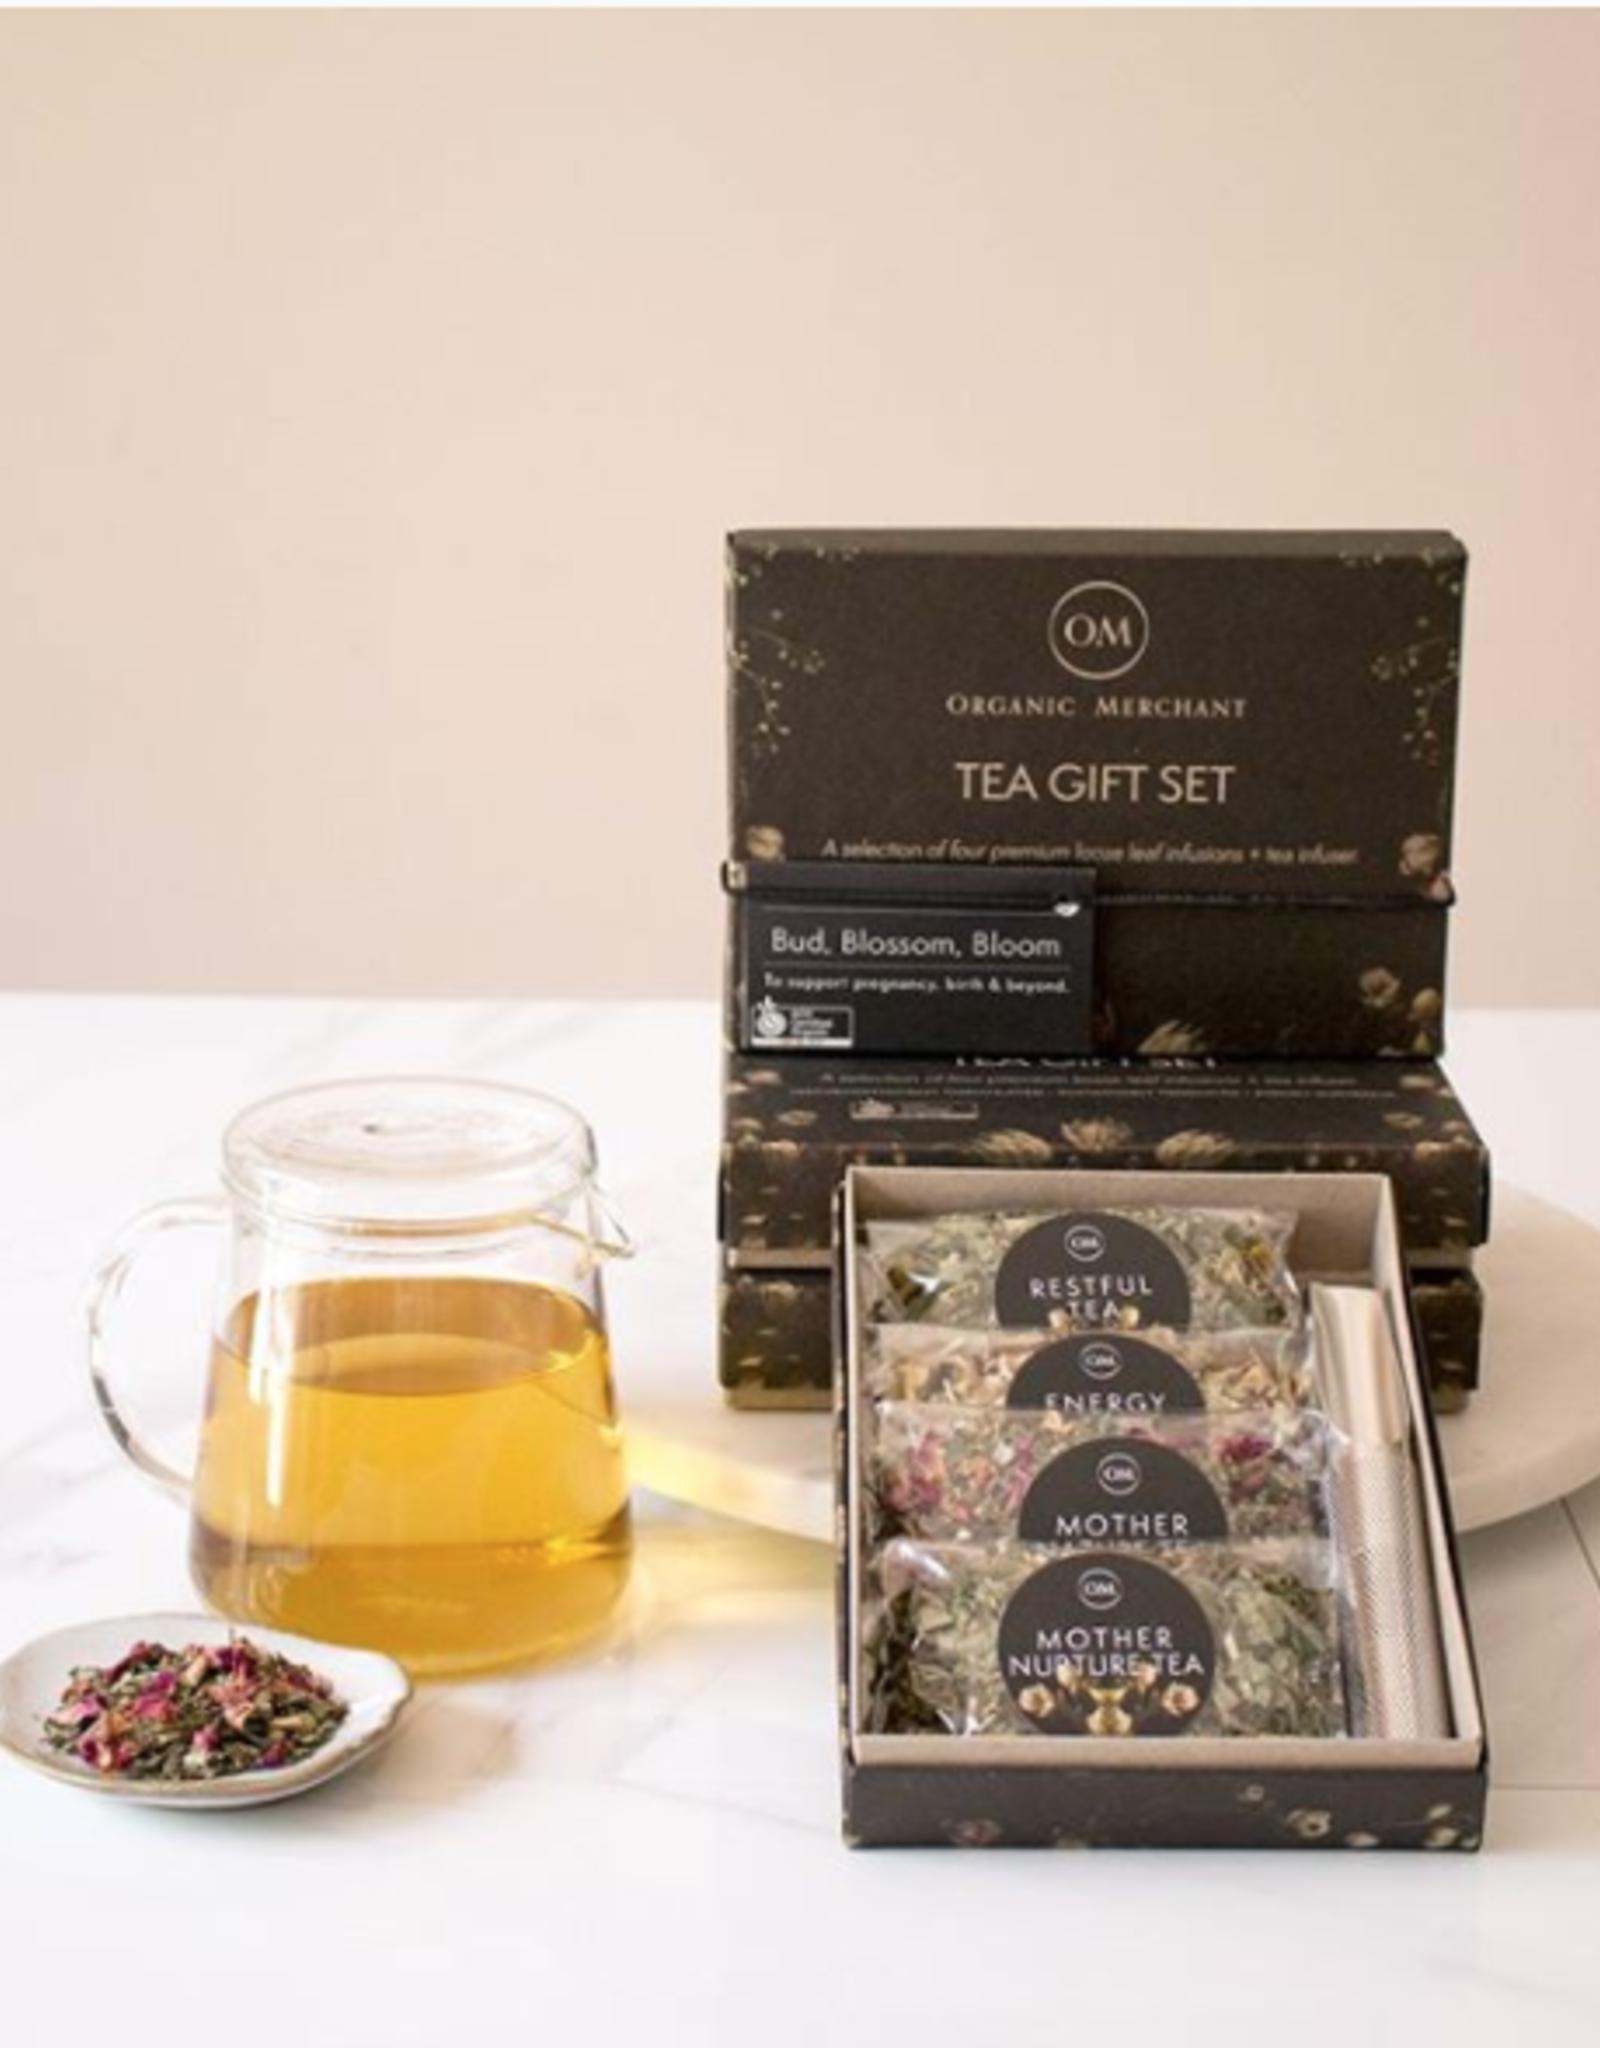 Organic Merchant Bud, Blossom and Bloom Tea Gift Set